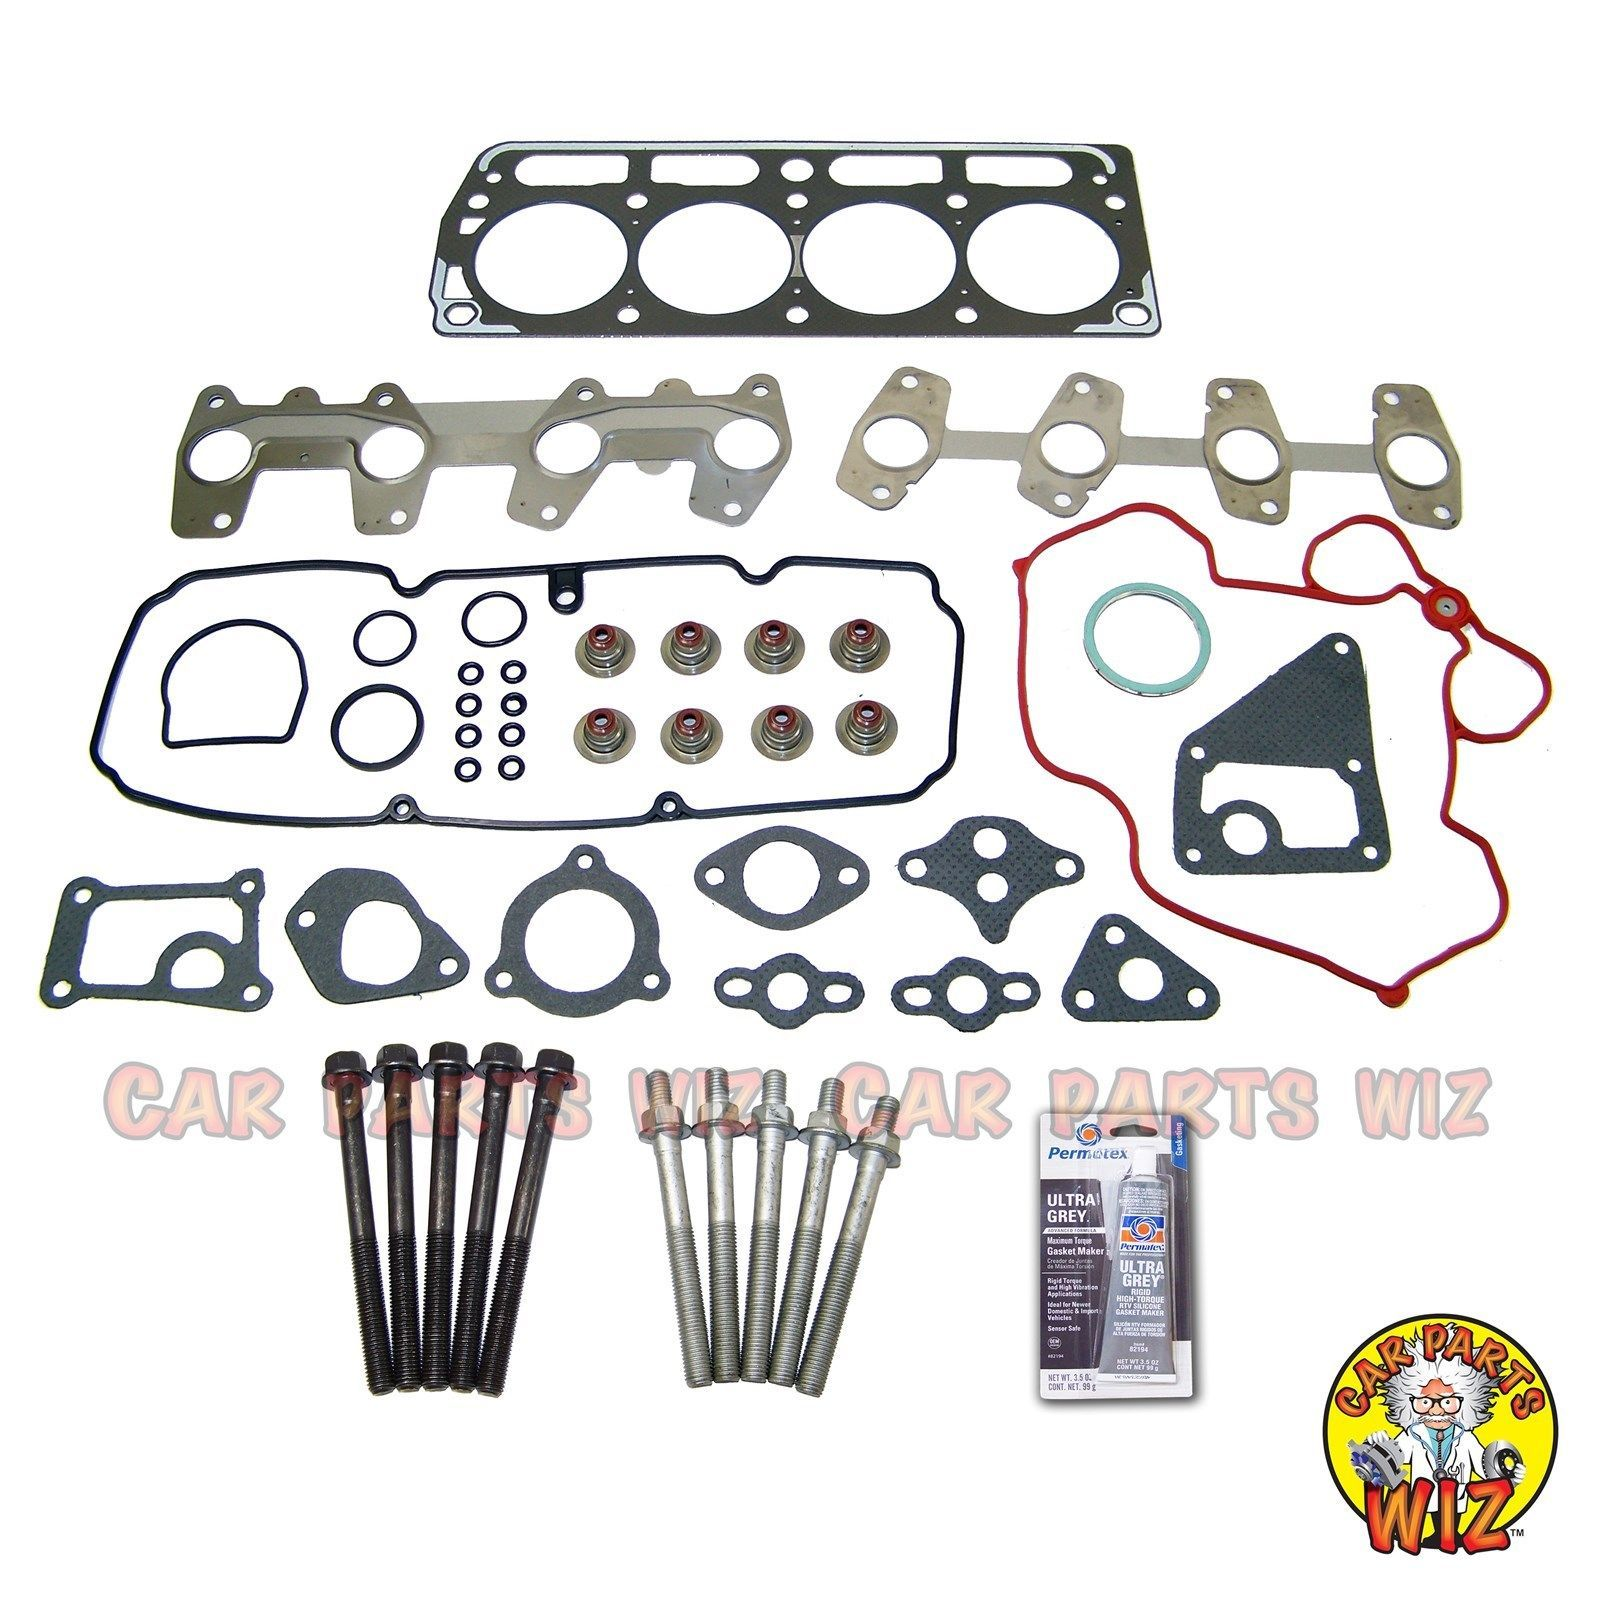 3.1L Engine Cylinder Head Bolts Kit Chevrolet Isuzu Oldsmobile Pontiac OHV V6